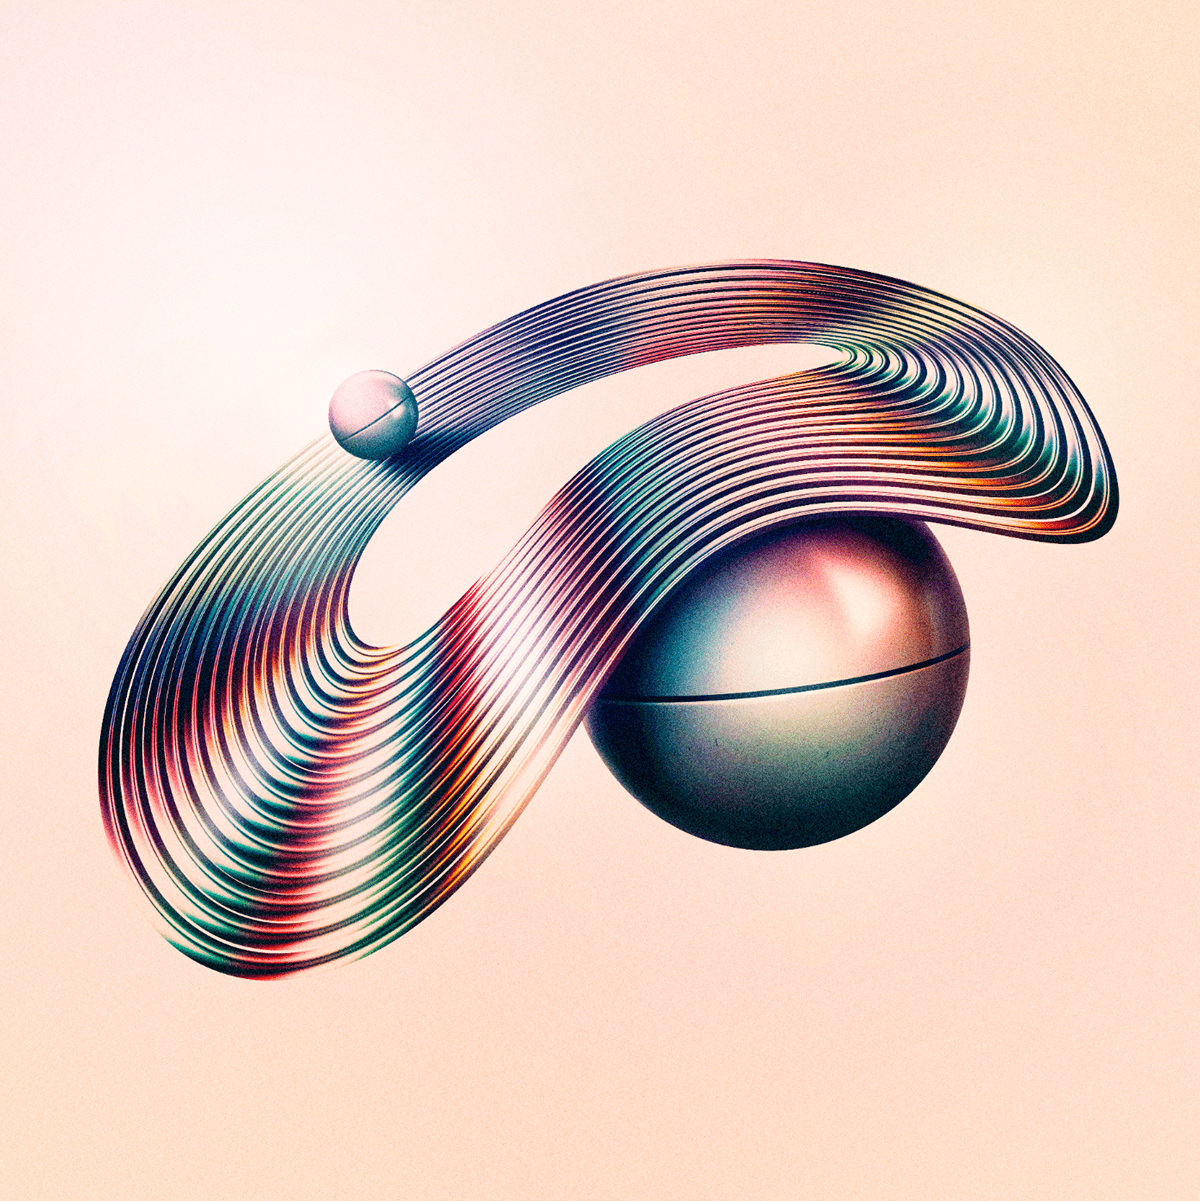 Image may contain: ball and abstract